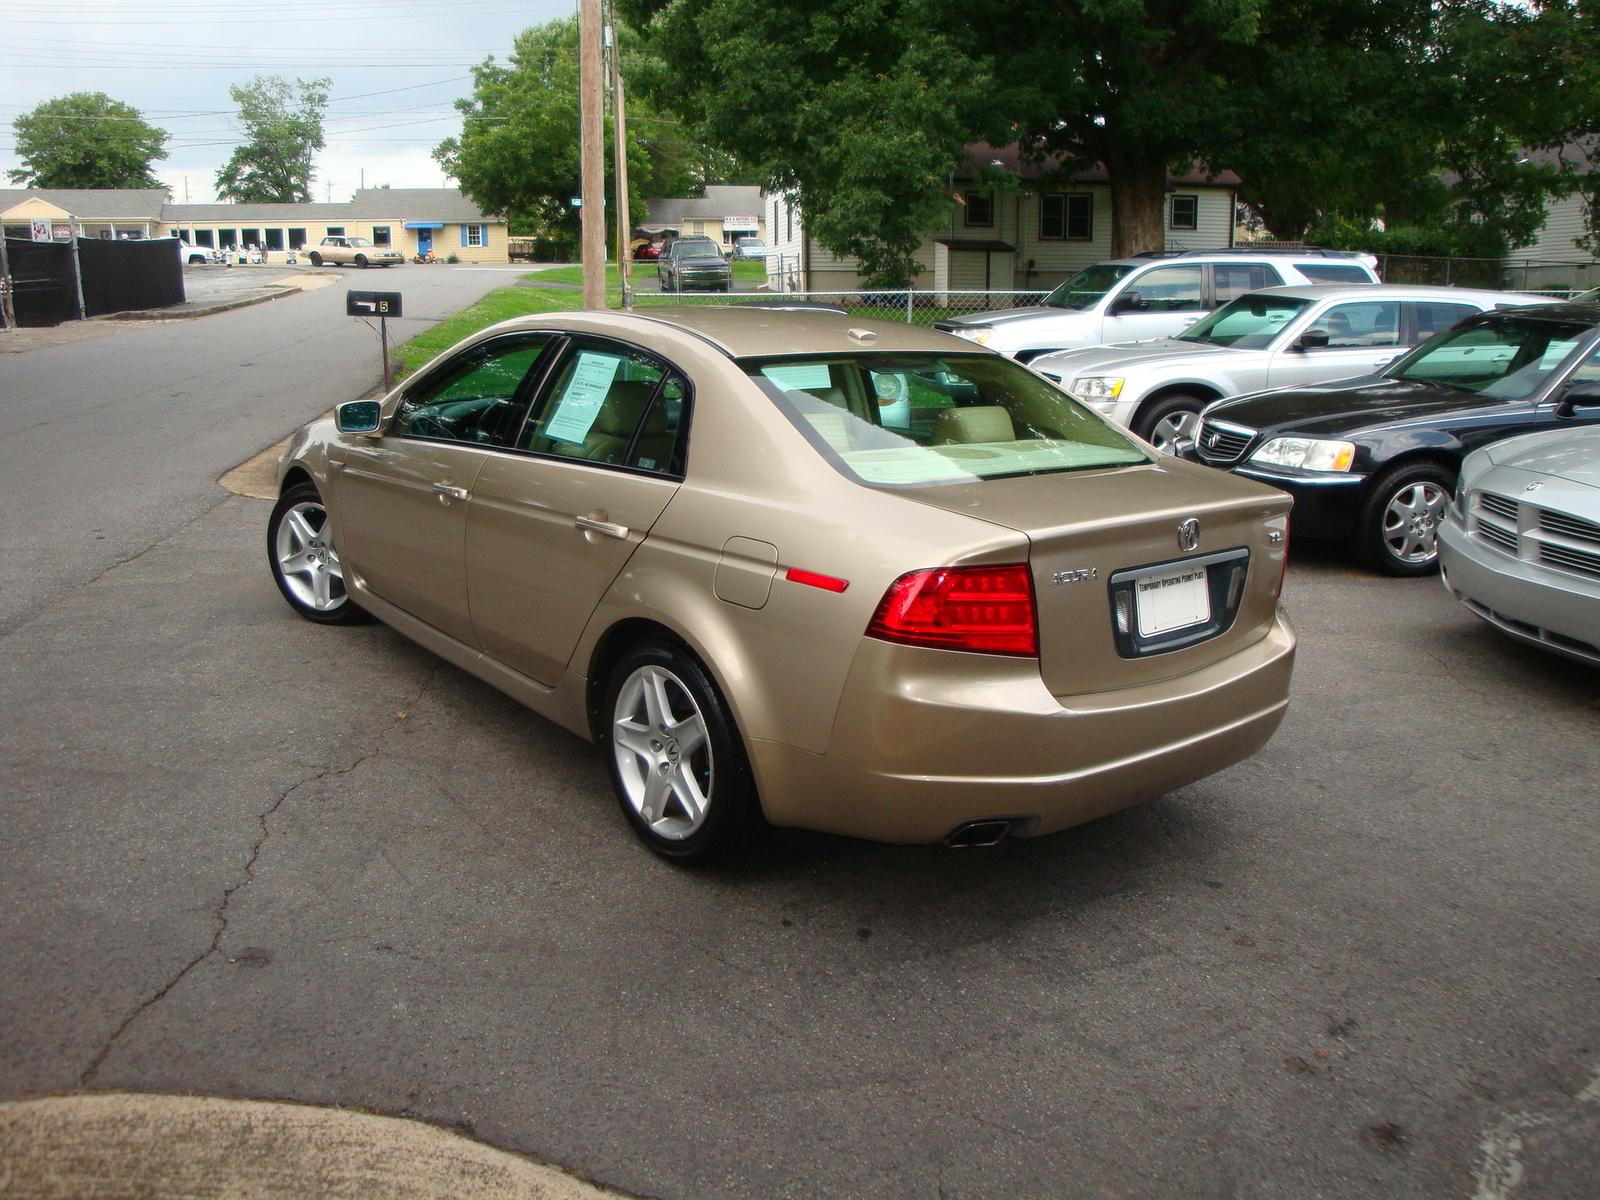 1998 Honda Accord Reviews >> 2004 Acura TL - Pictures - CarGurus